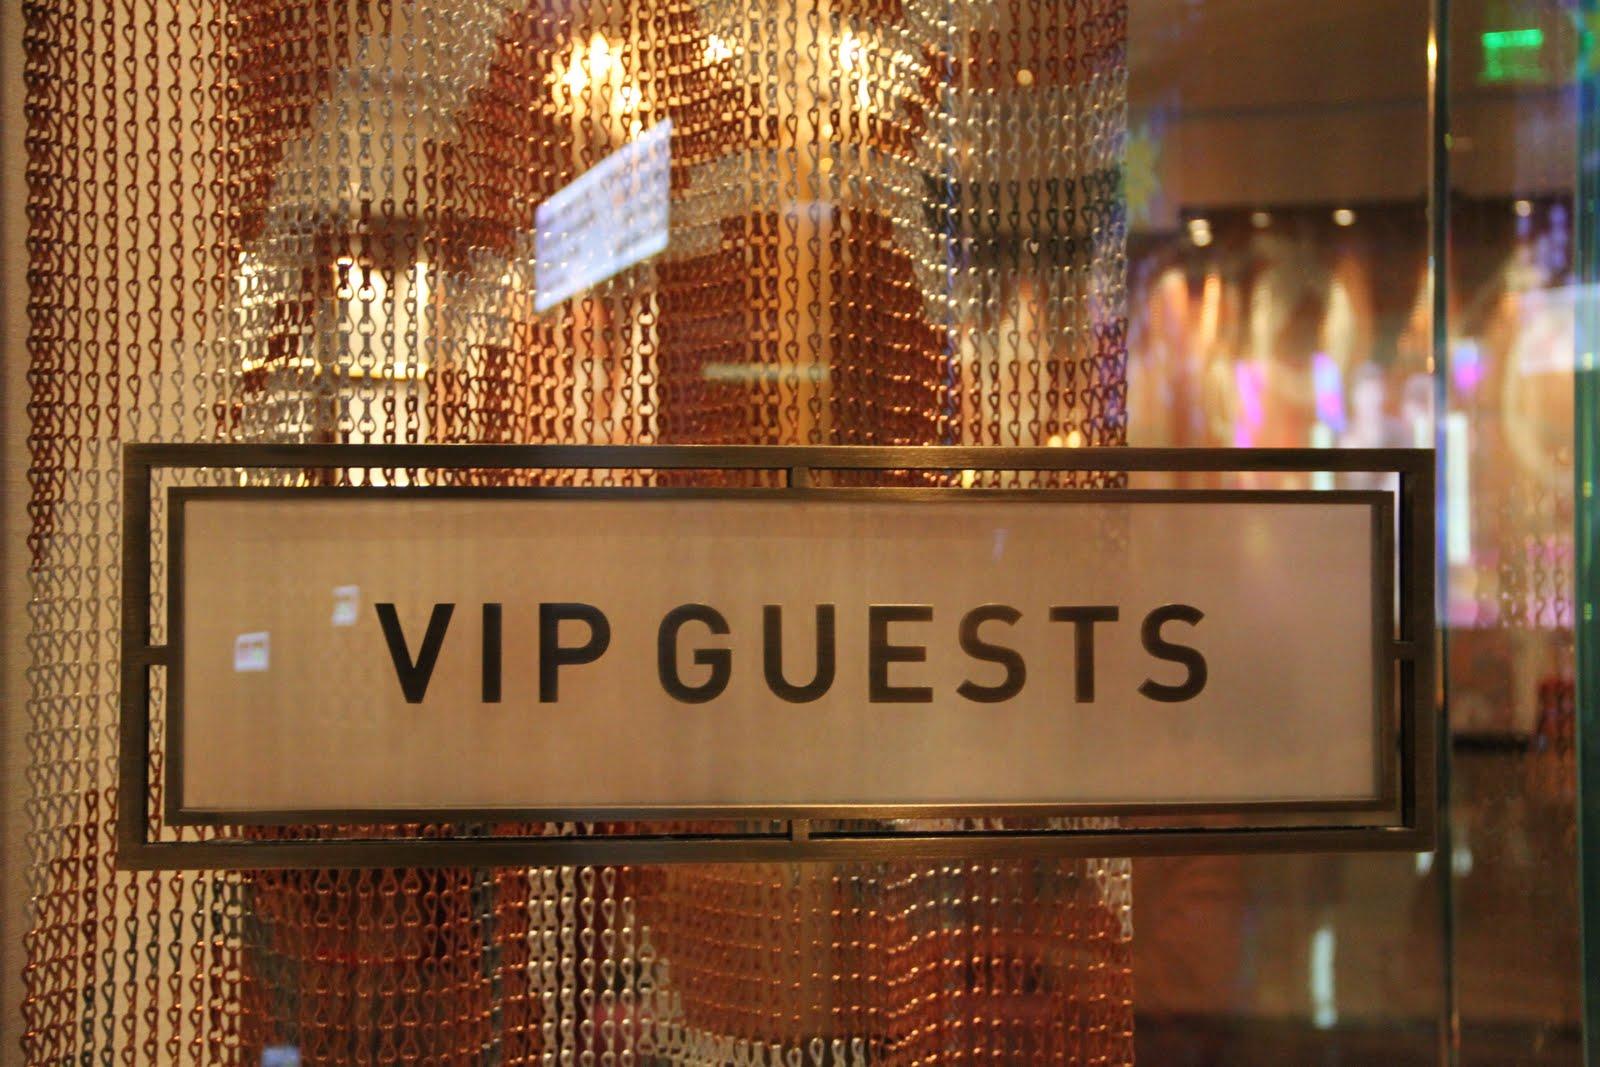 http://lasvegassuites.com/wp-content/uploads/2016/10/VIP-Guests.jpg